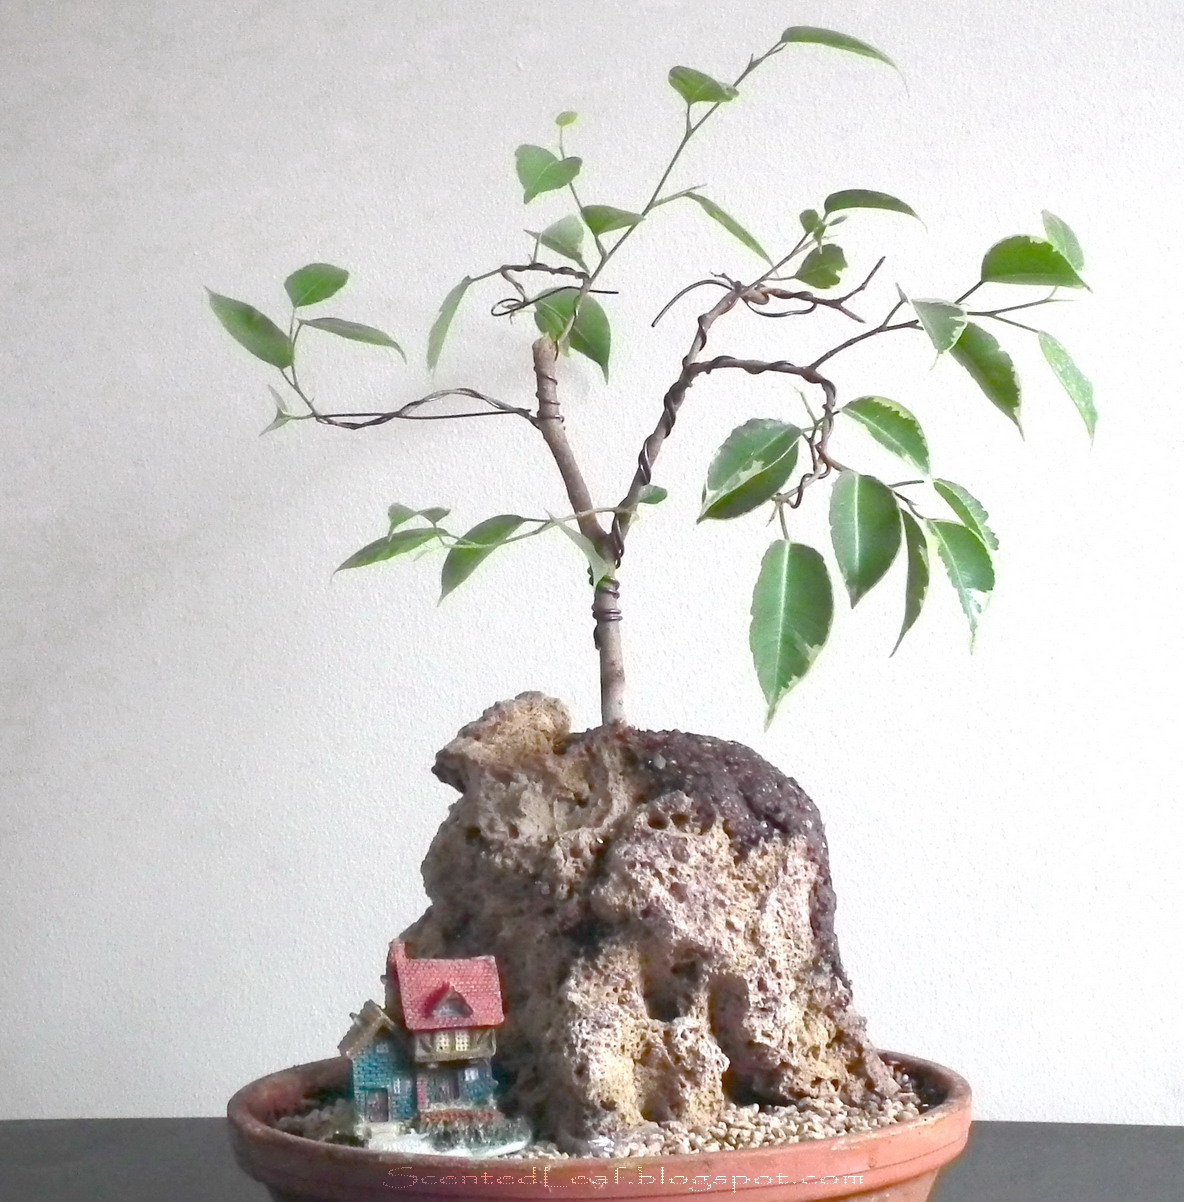 Scented Leaf Ficus Prebonsai Addition For Terrariums